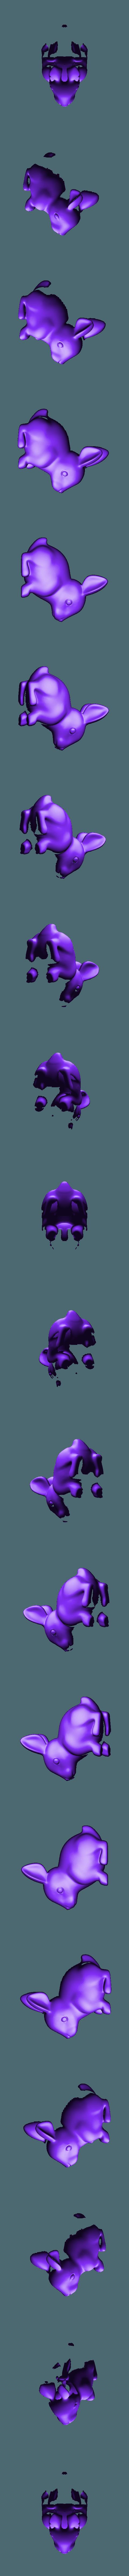 rabbit.stl Download STL file rabbit • 3D printable design, bs3